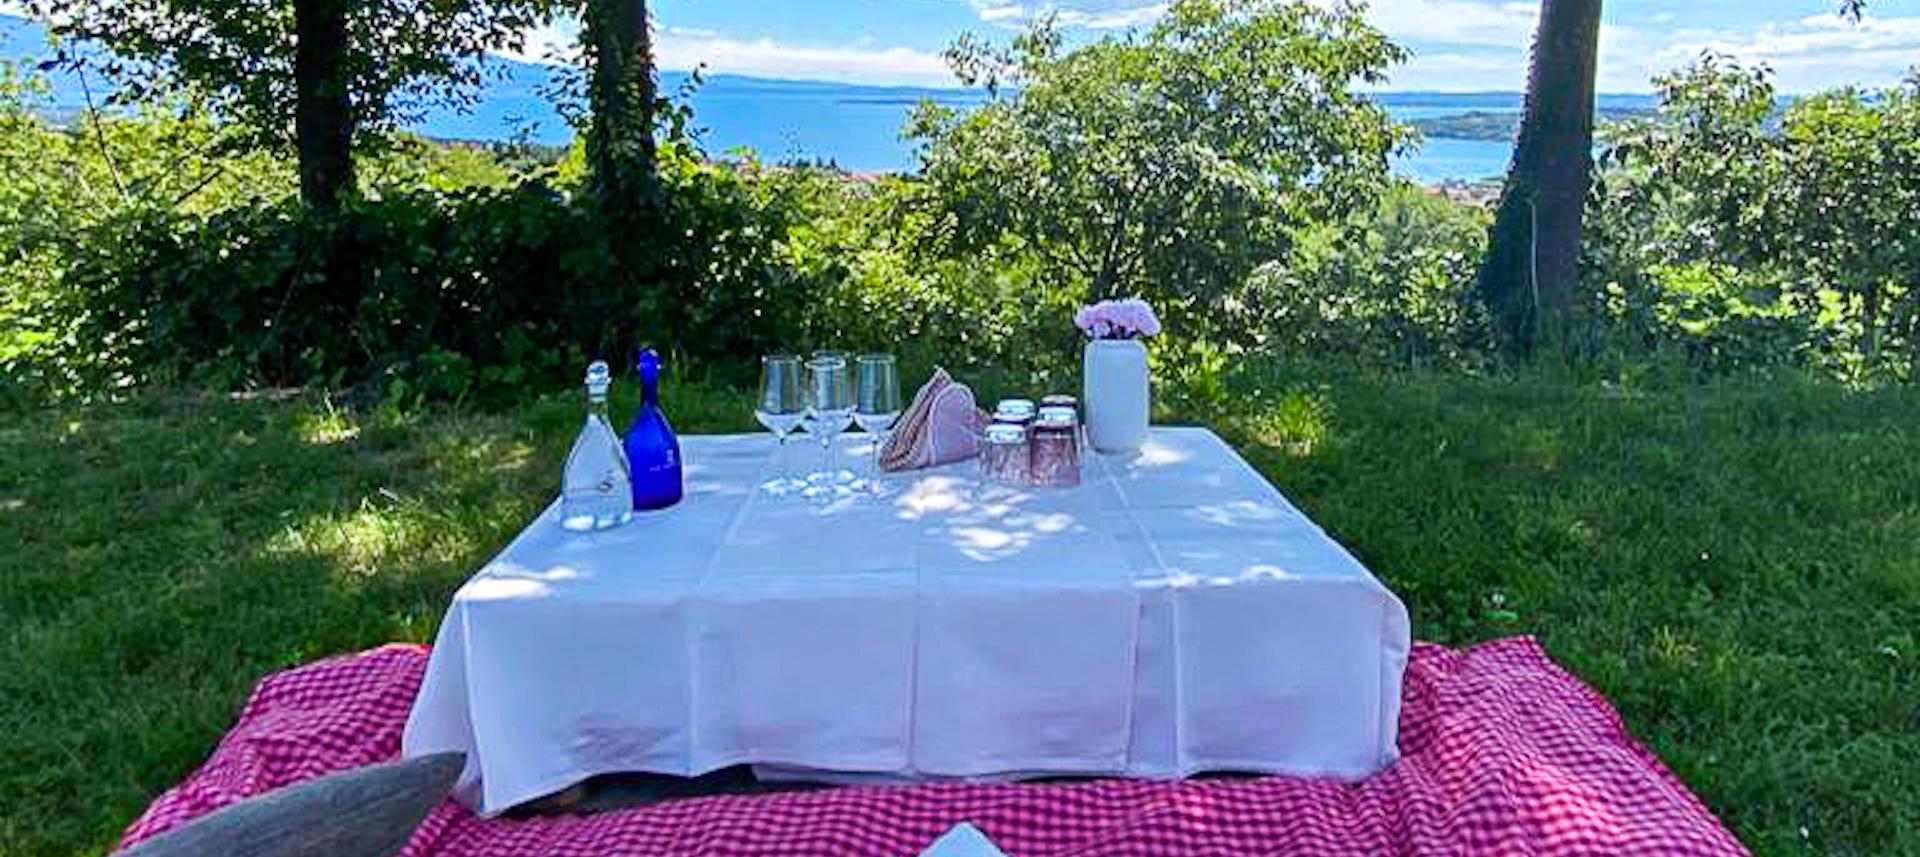 picnic in vigneto vista lago